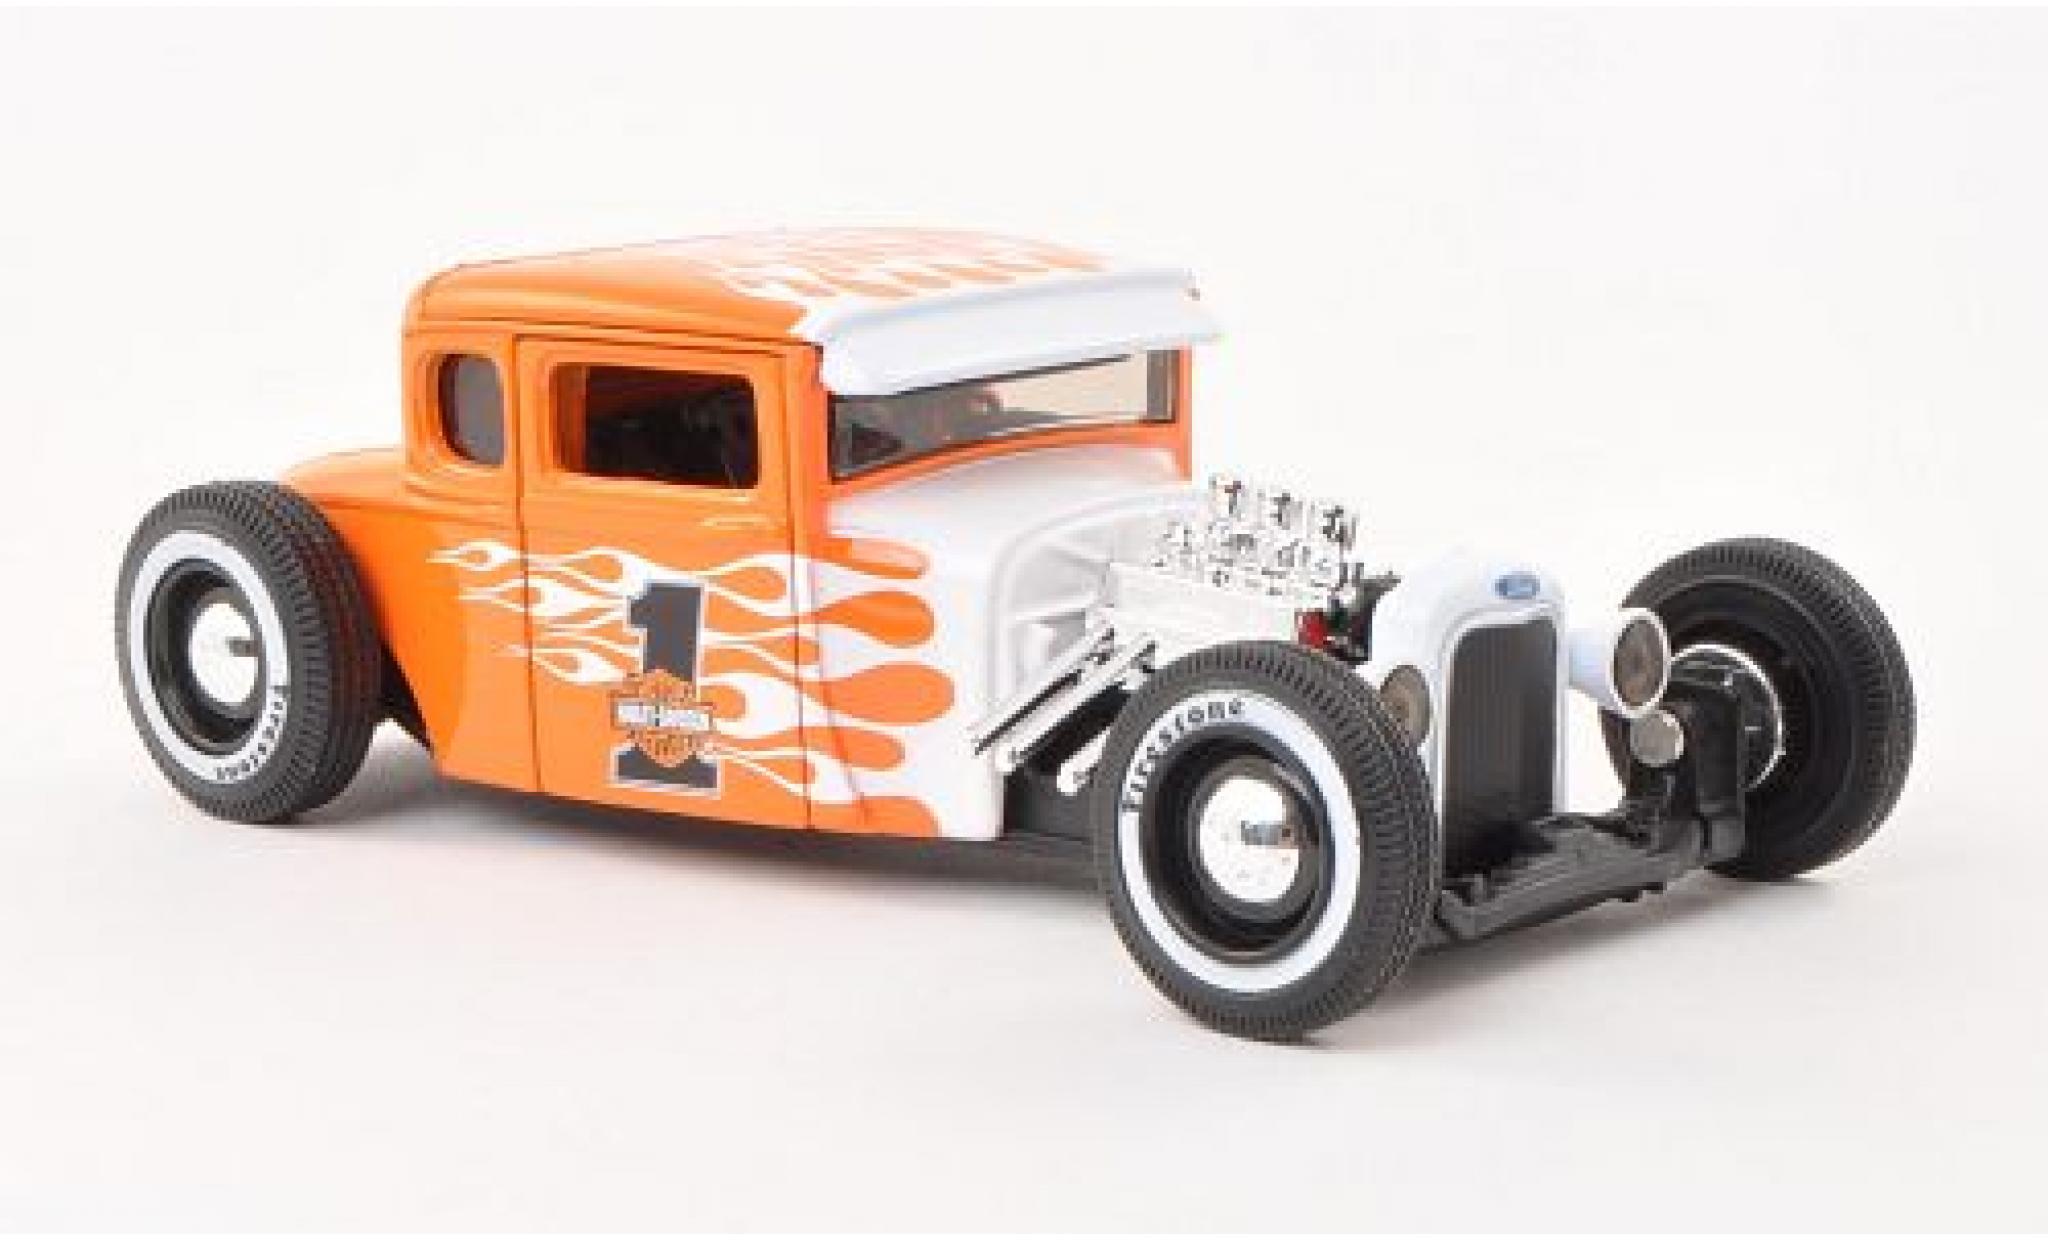 Ford Model A 1/24 Maisto Hot Rod No.1 orange/Dekor Harley-Davidson 1929